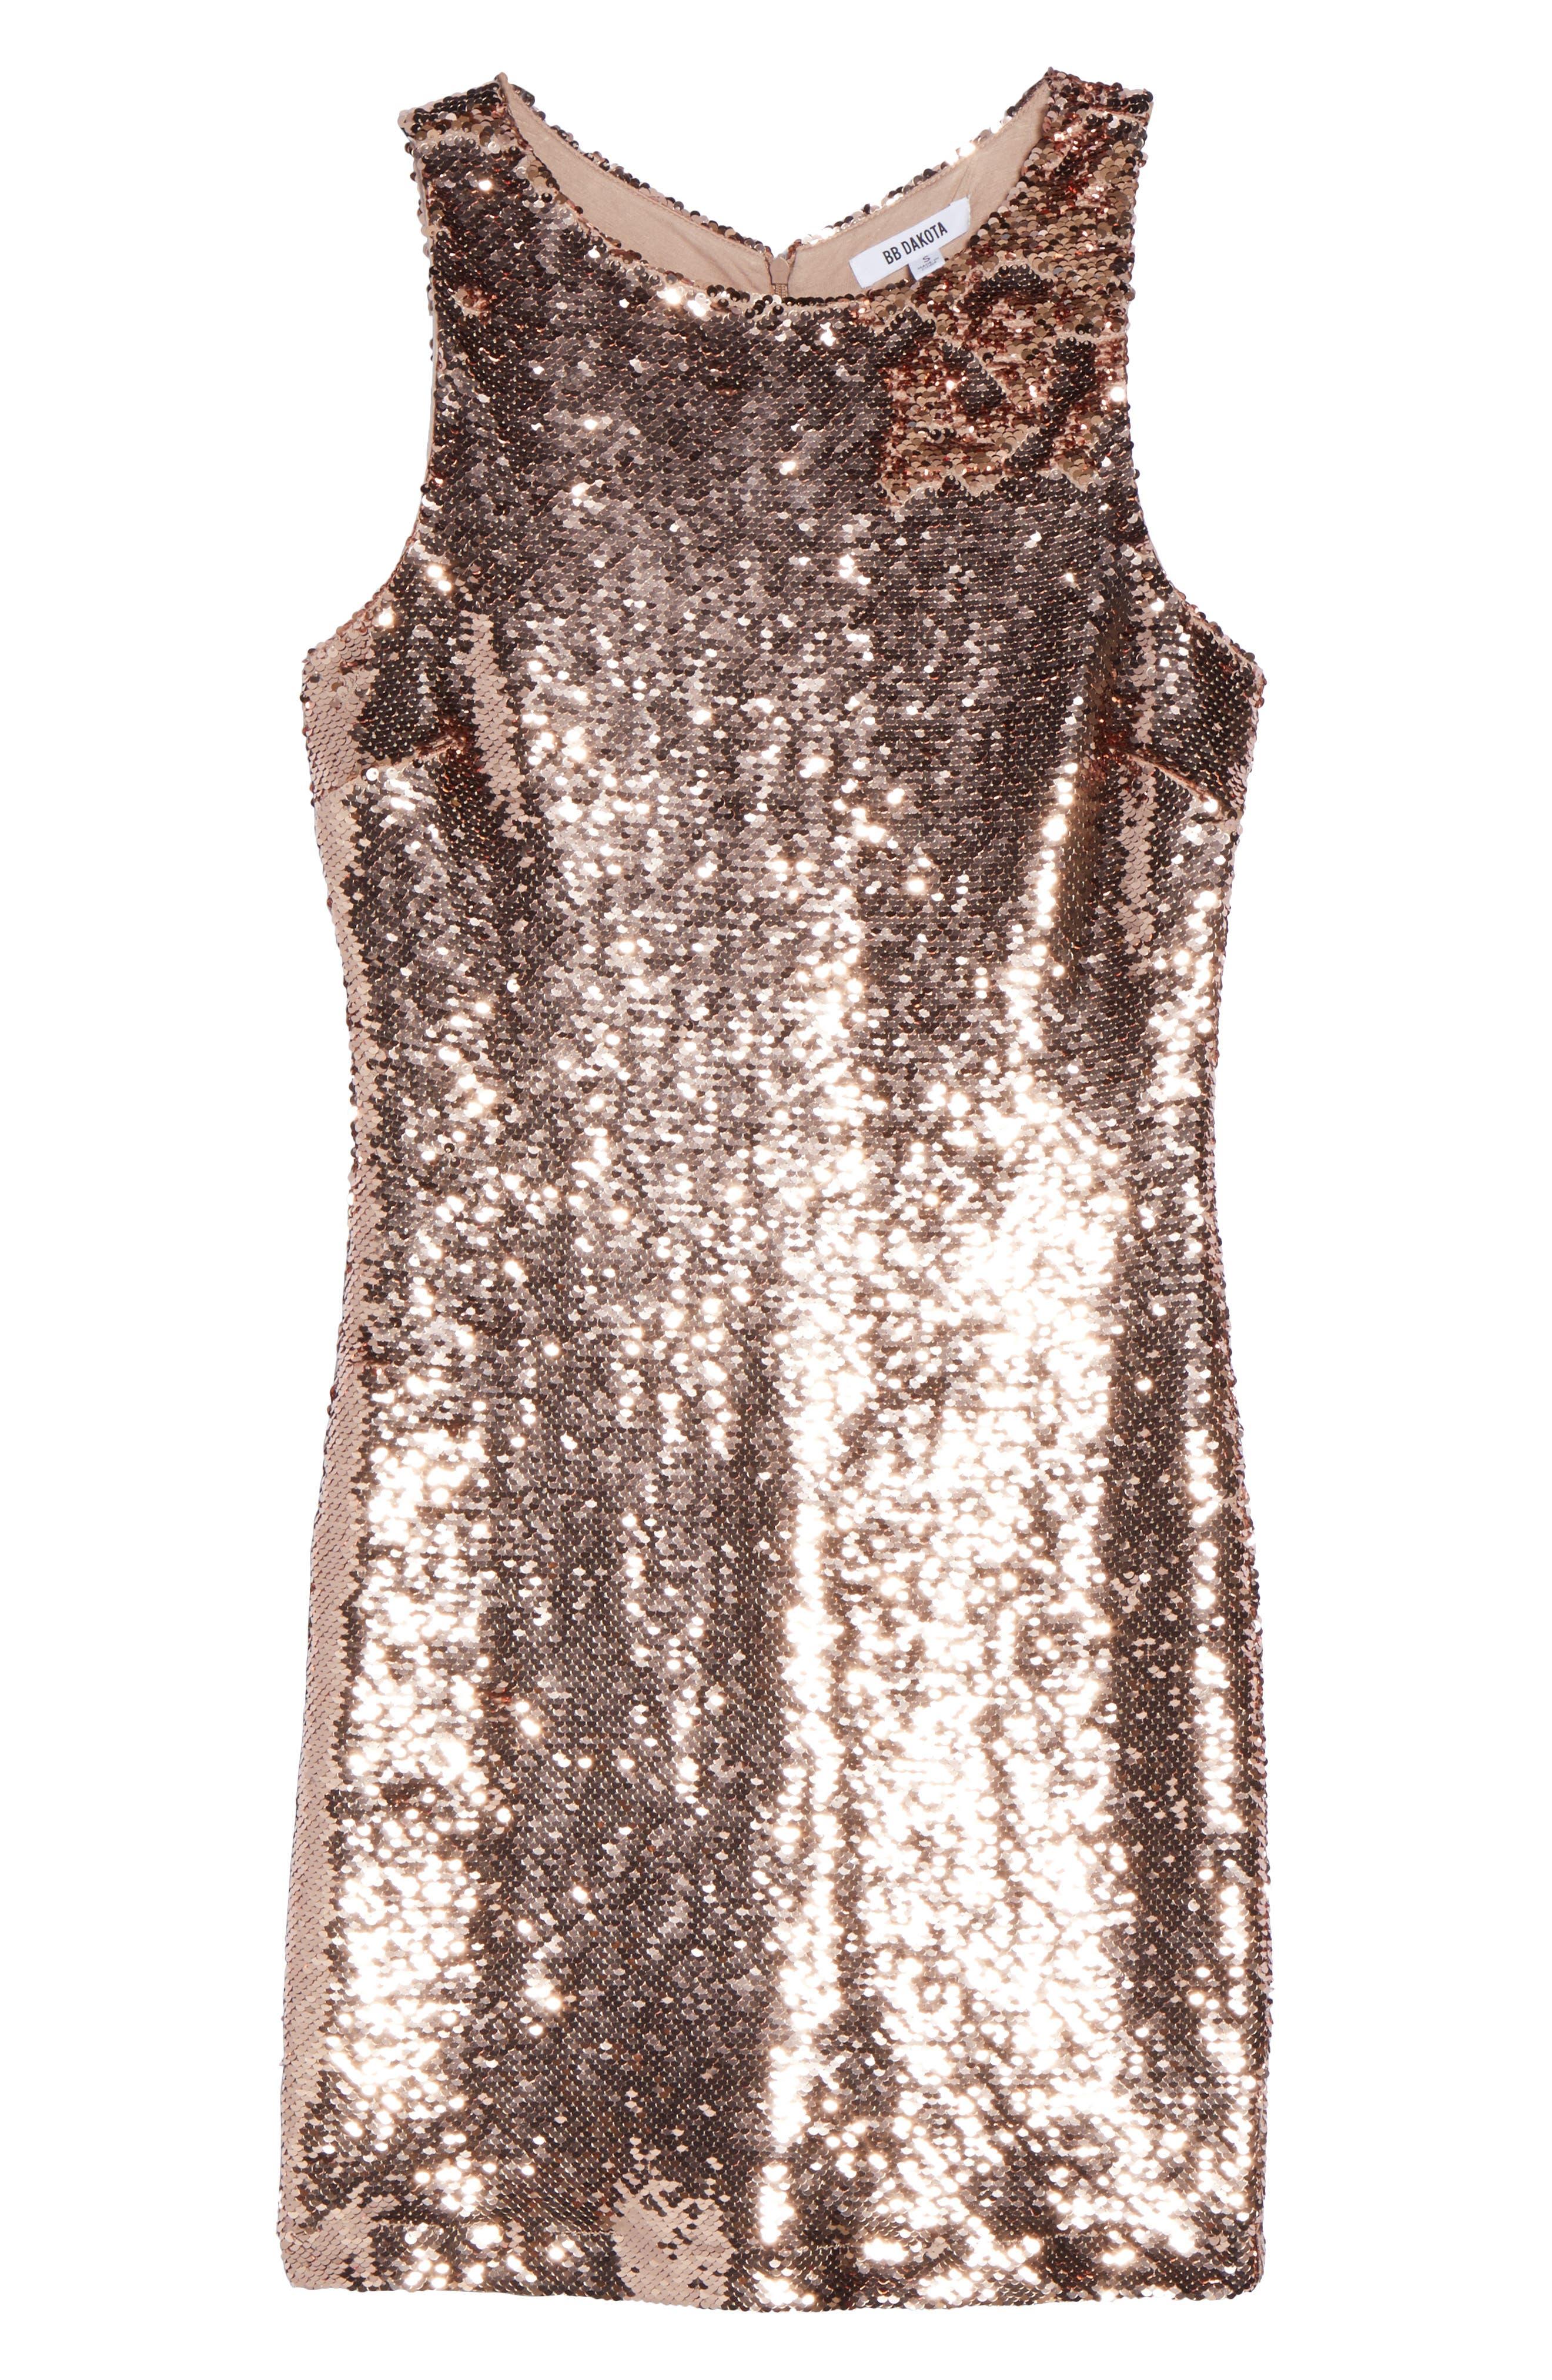 Garland Sequin Sheath Dress,                             Alternate thumbnail 6, color,